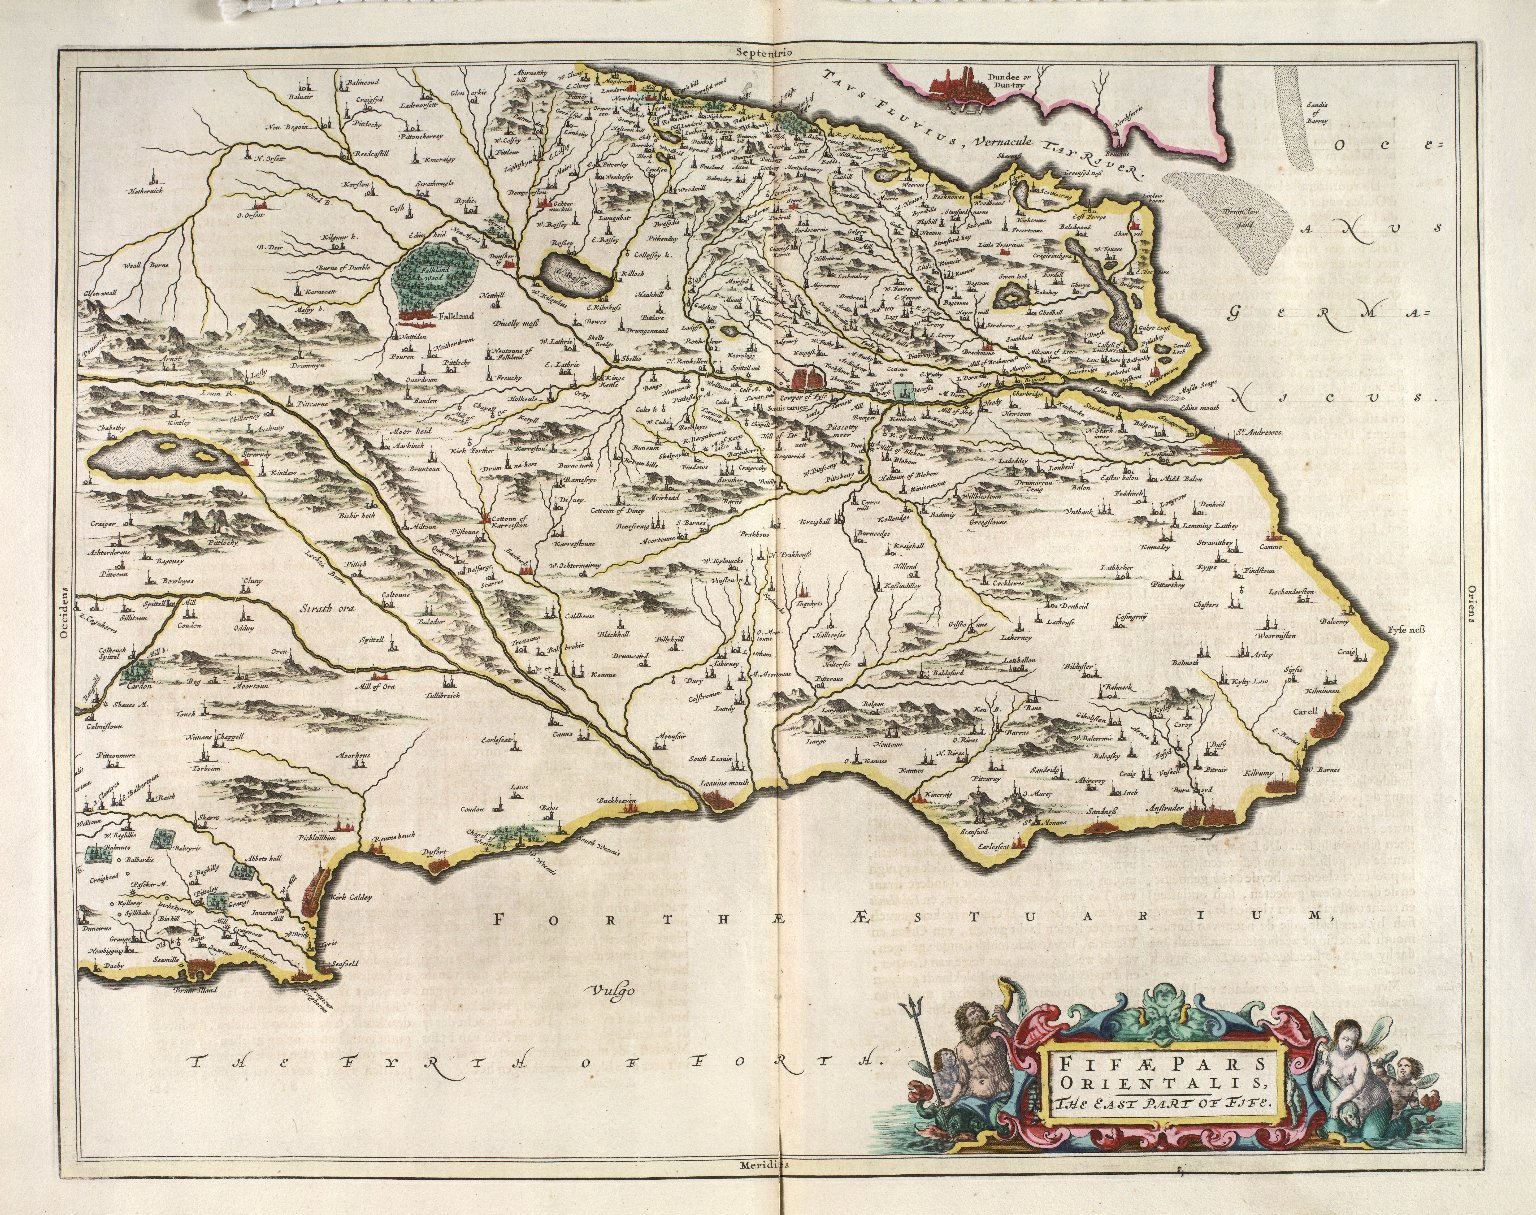 [Geographiae Blavianae] [Also known as: Atlas major] [092 of 153]